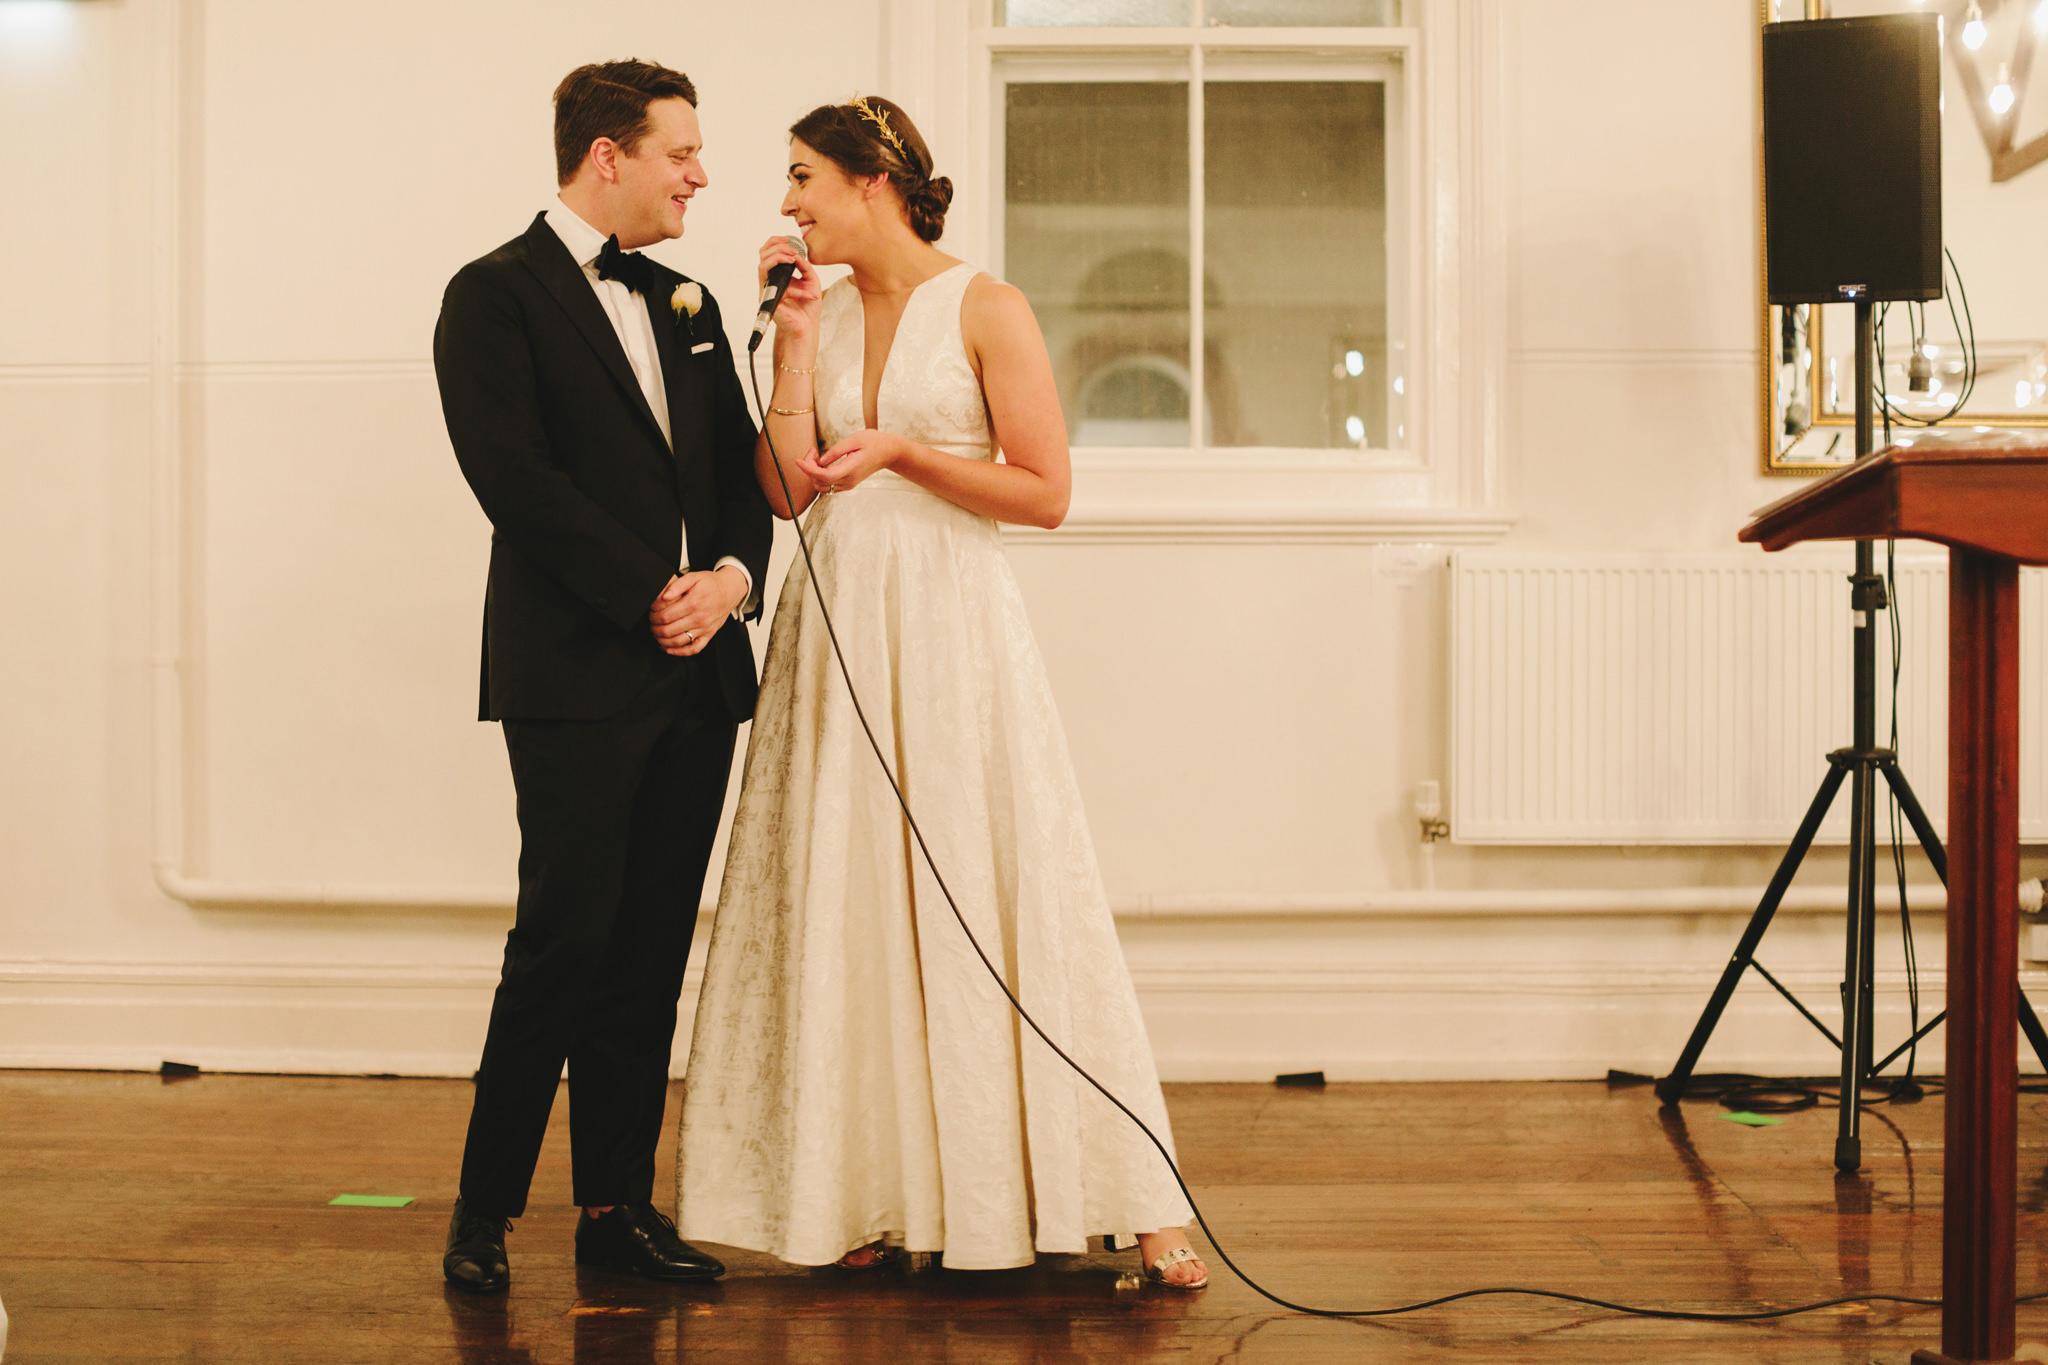 Abbotsford_Convent_Wedding_Peter_Anna127.JPG